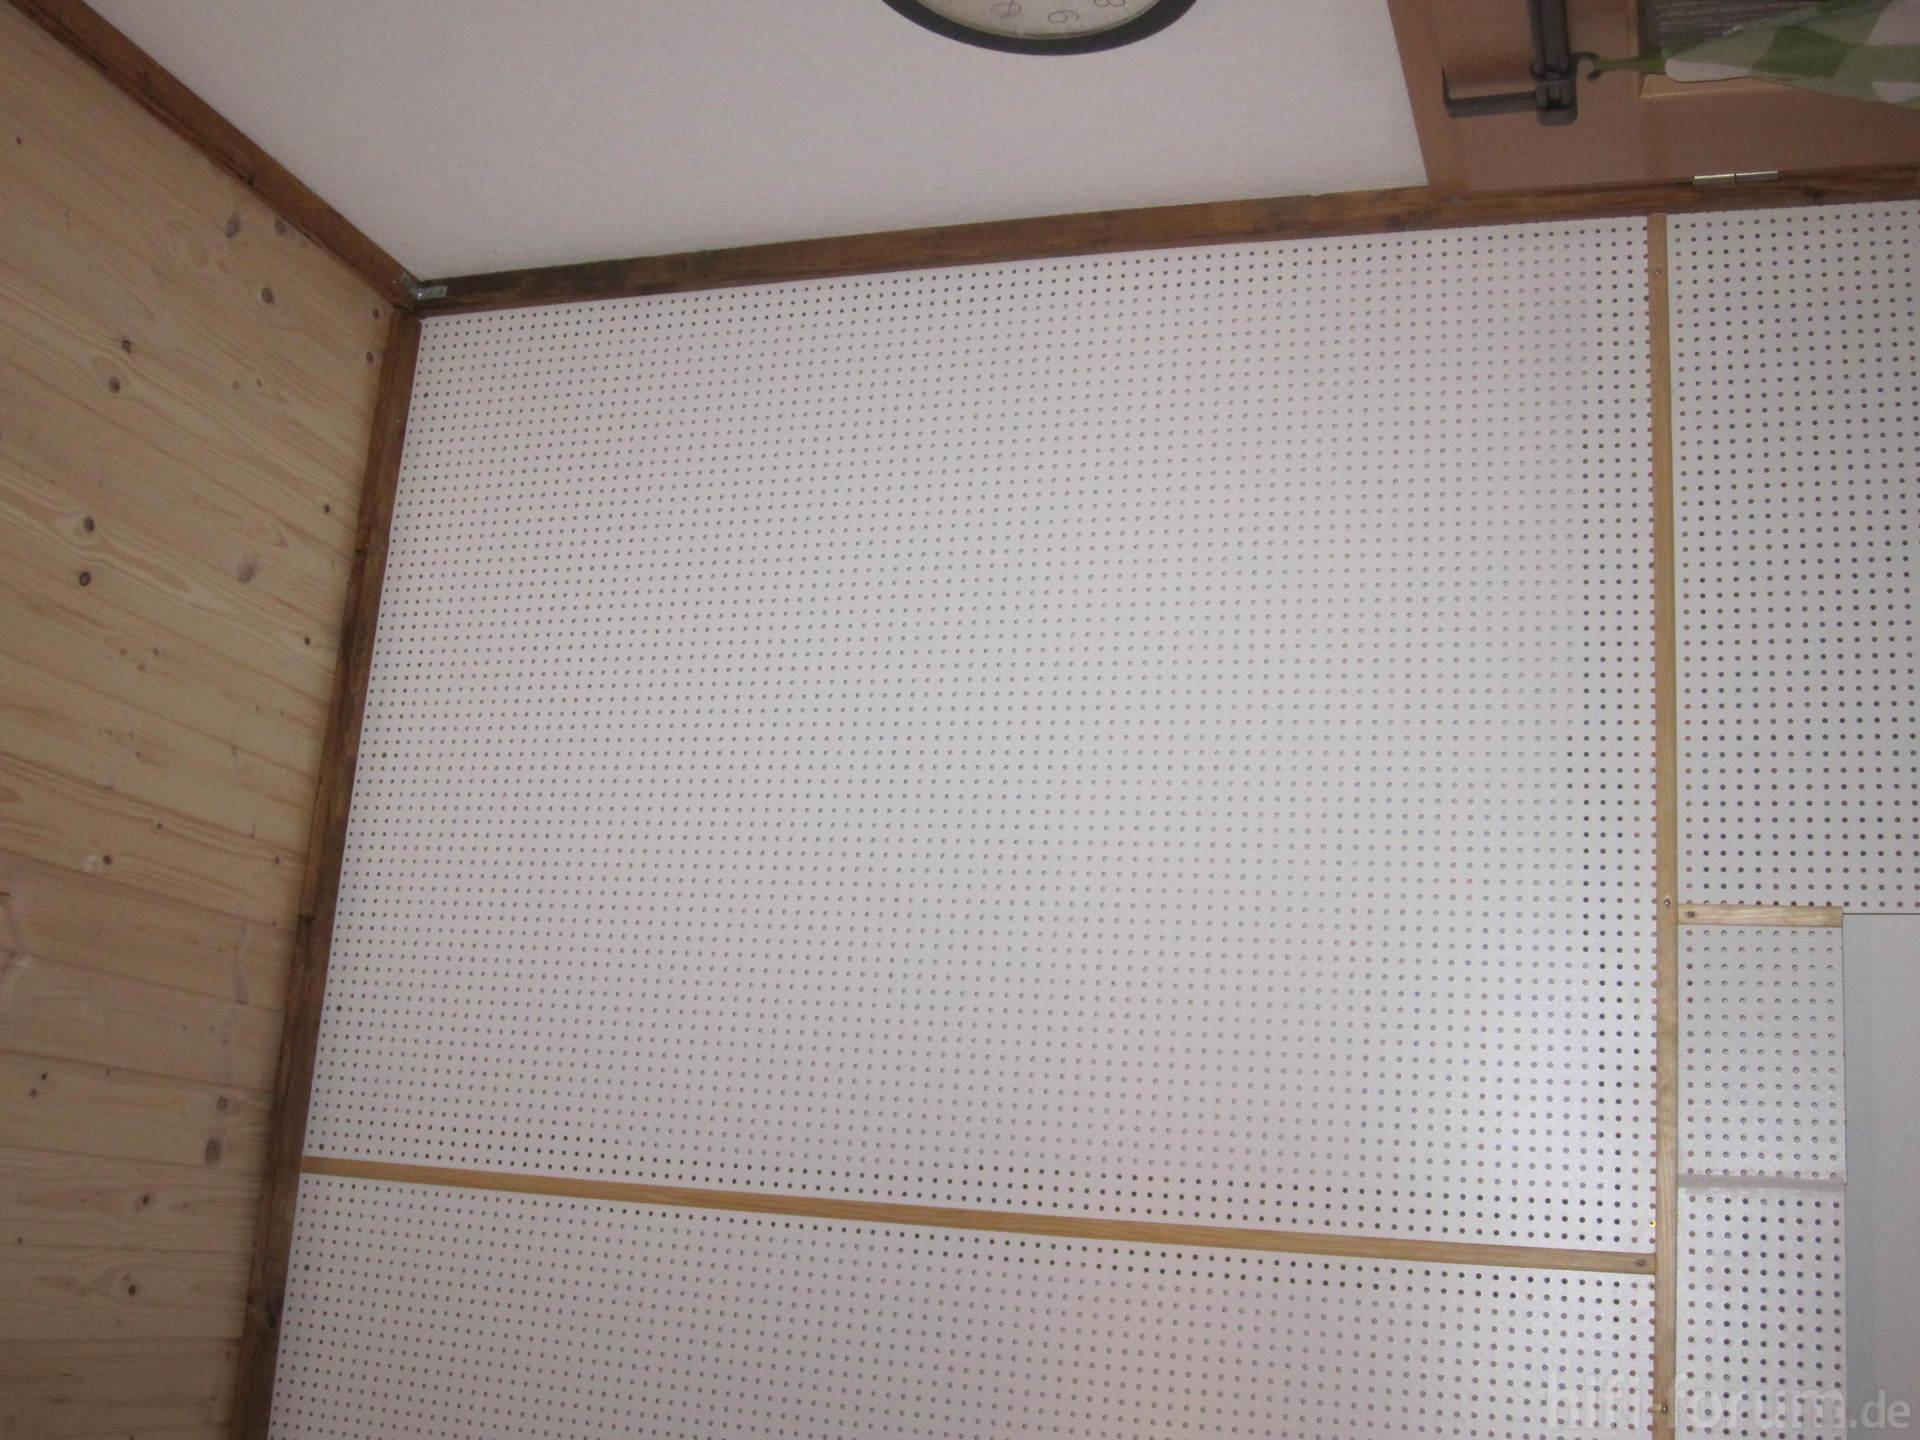 3mm lochplatte an der wand 3mm akustik lochplatte wand hifi bildergalerie. Black Bedroom Furniture Sets. Home Design Ideas